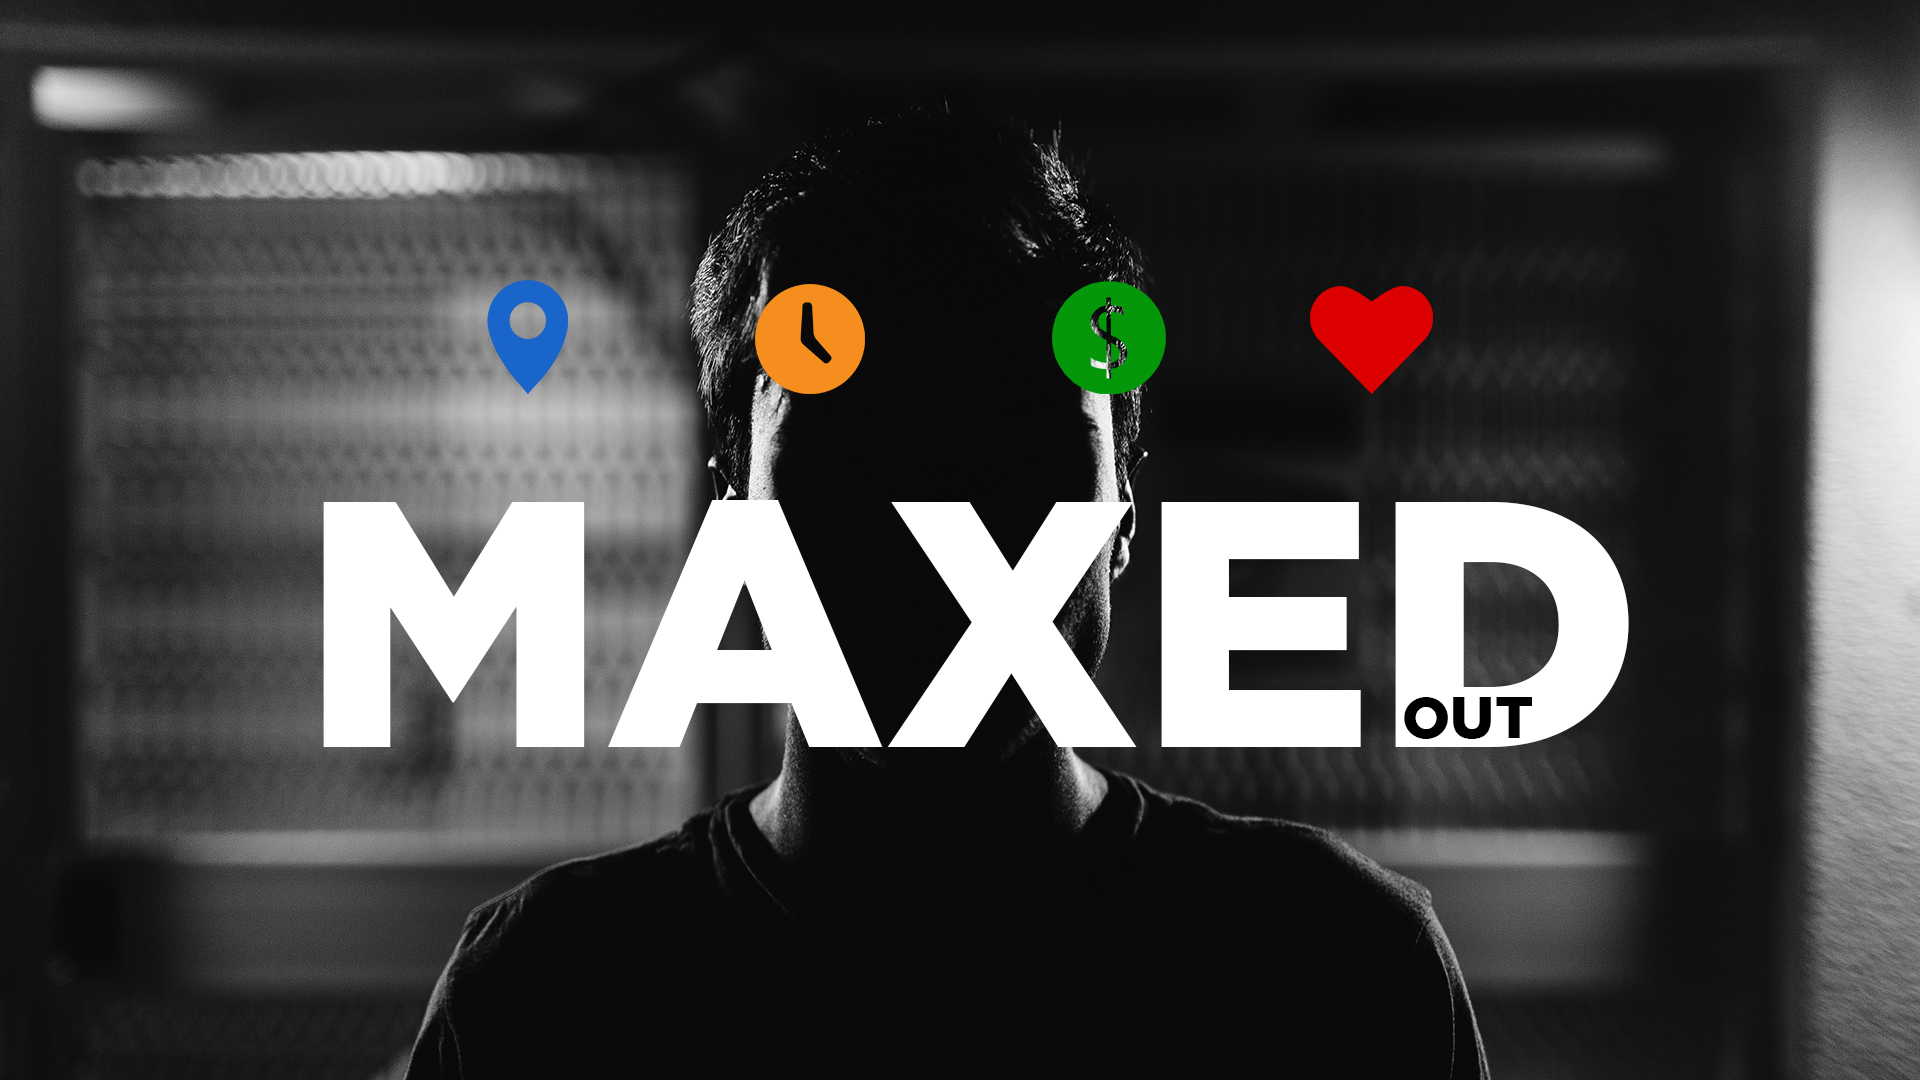 maxed-out-2.jpg